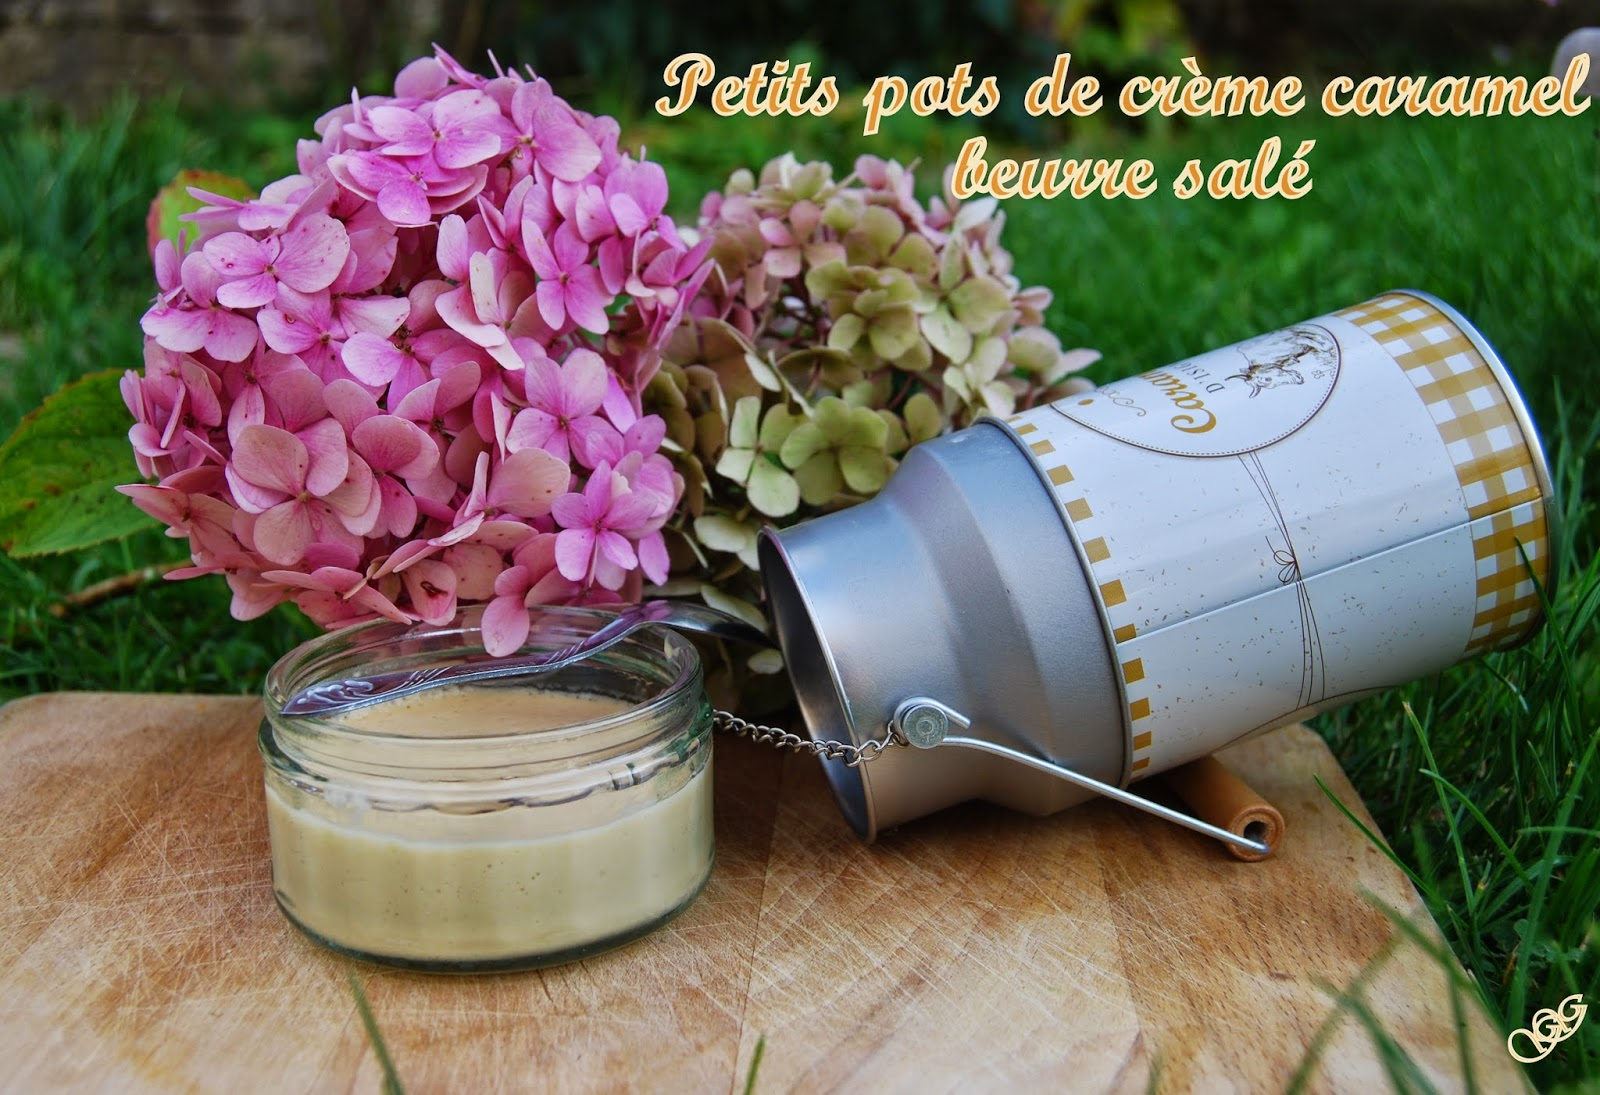 Crèmes Caramel beurre salé